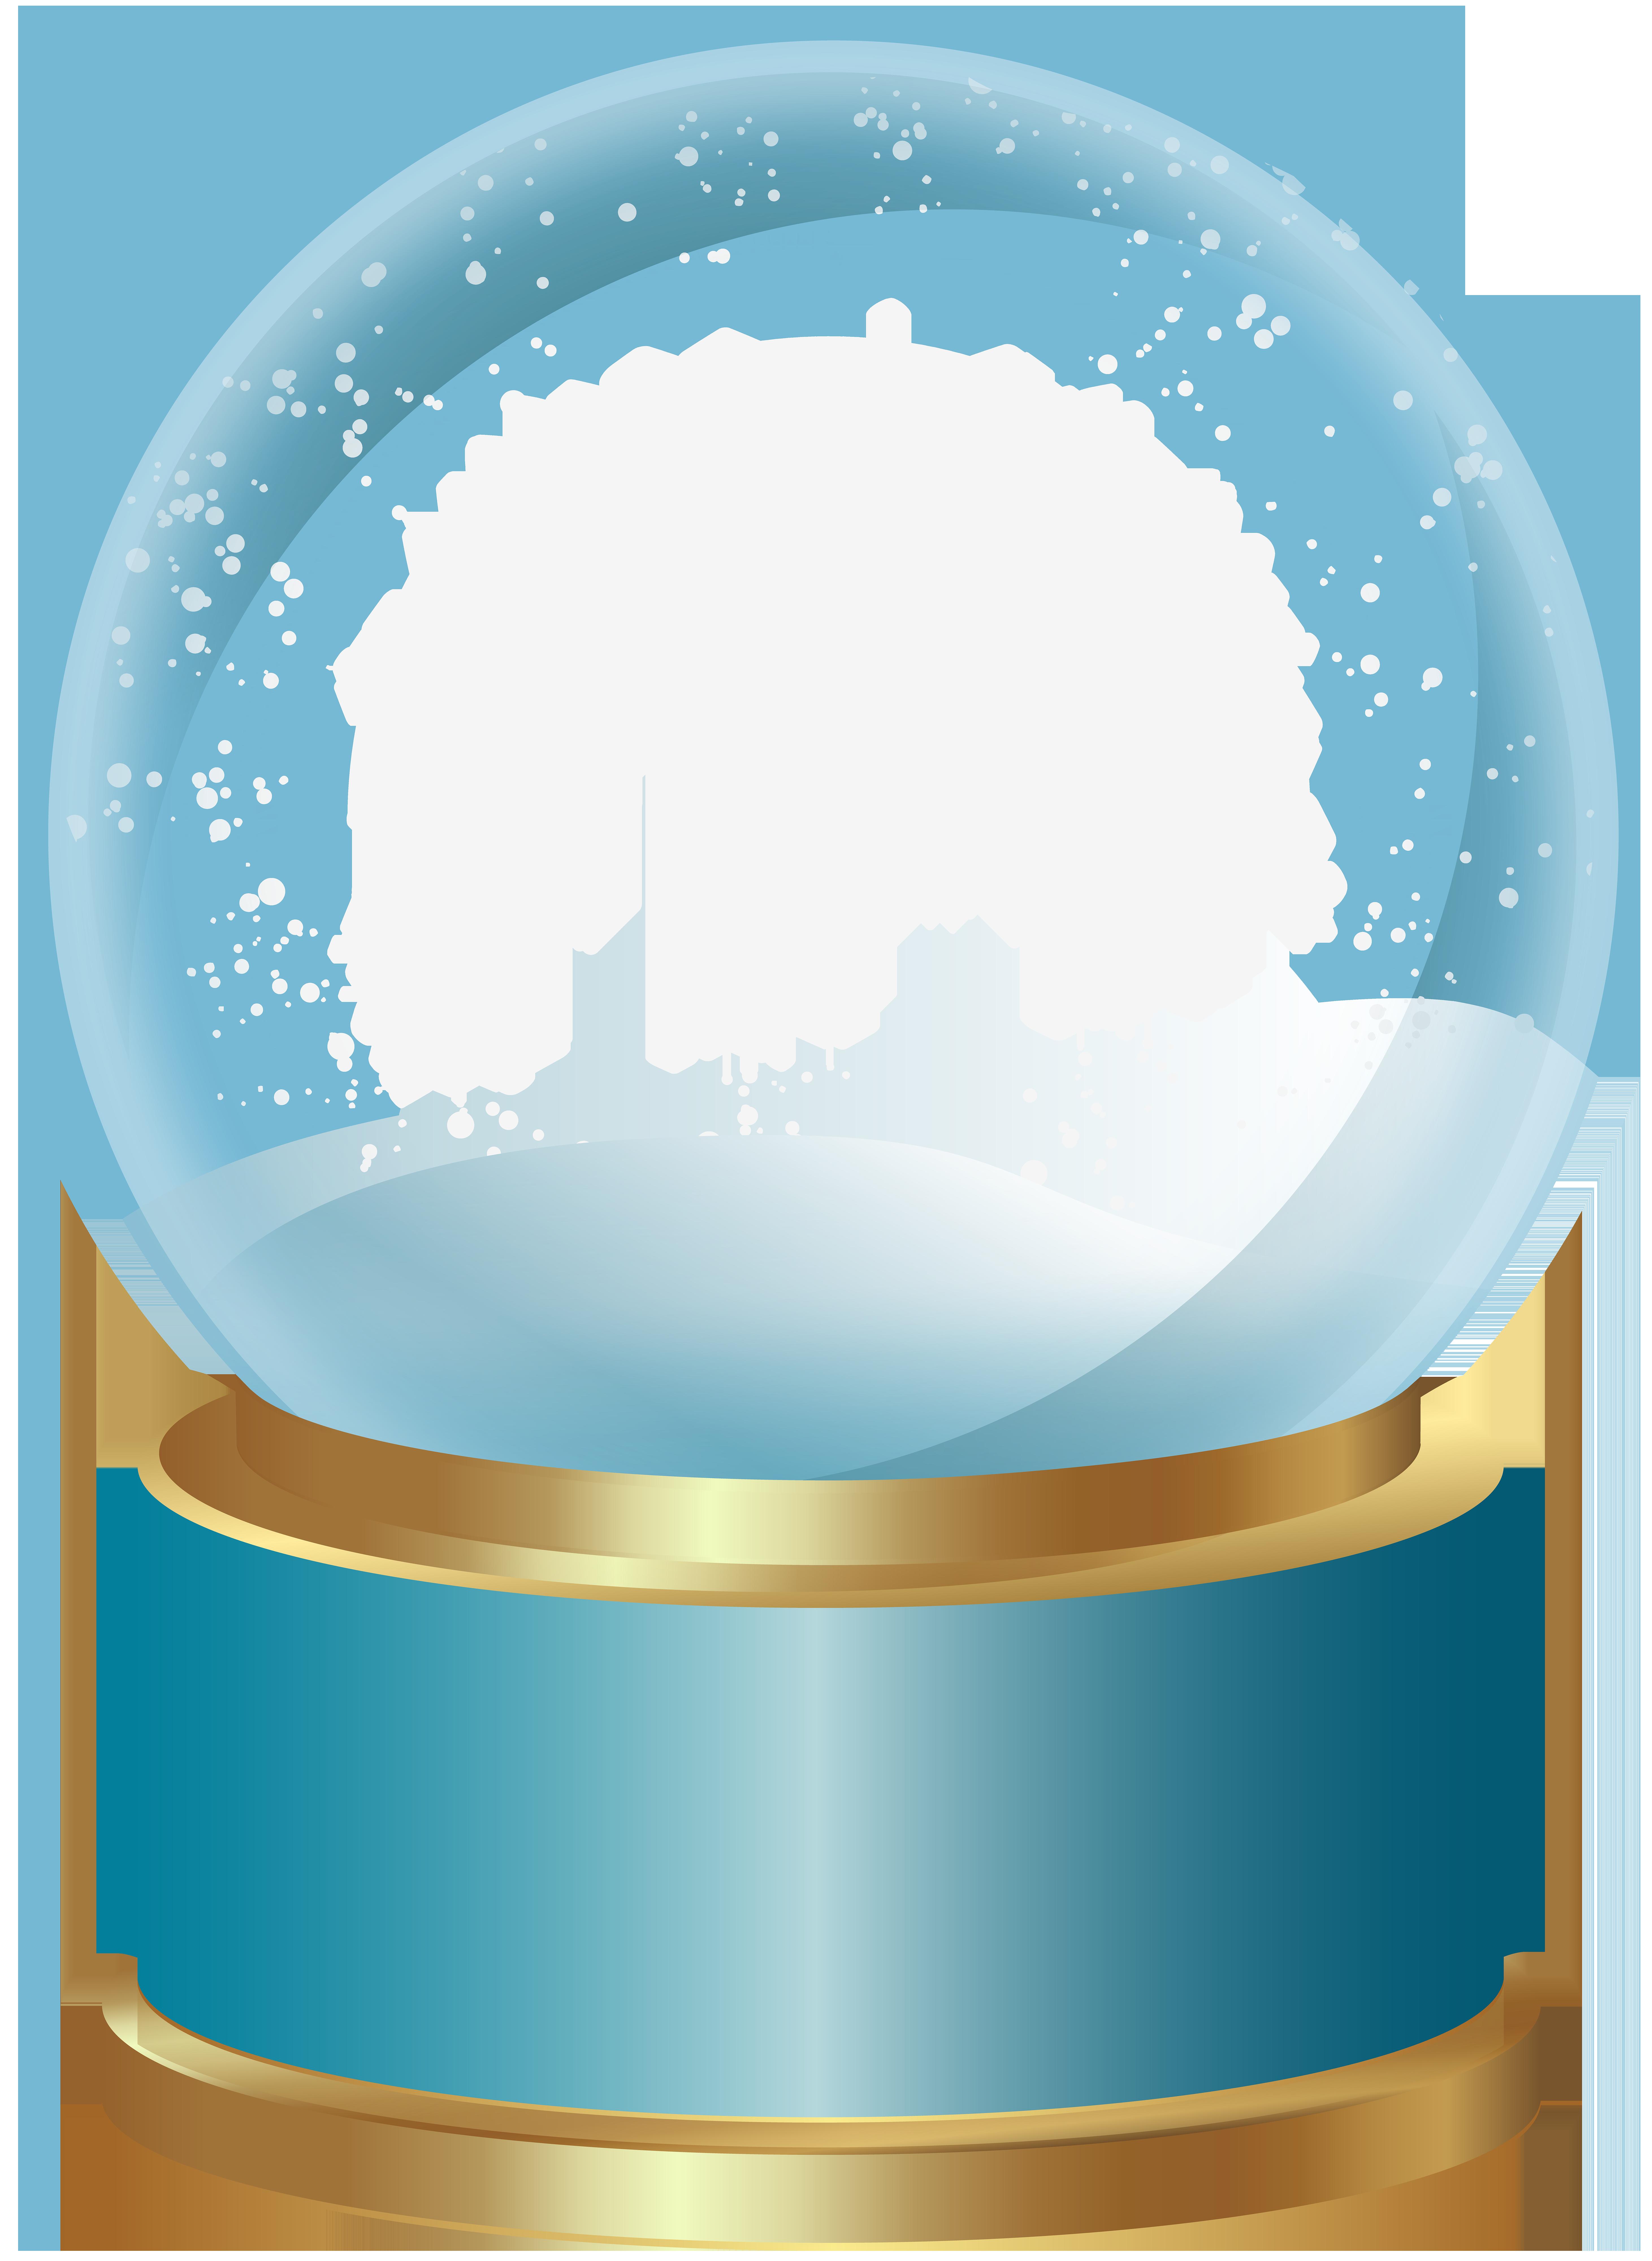 Globe clipart empty. Snow blue png clip